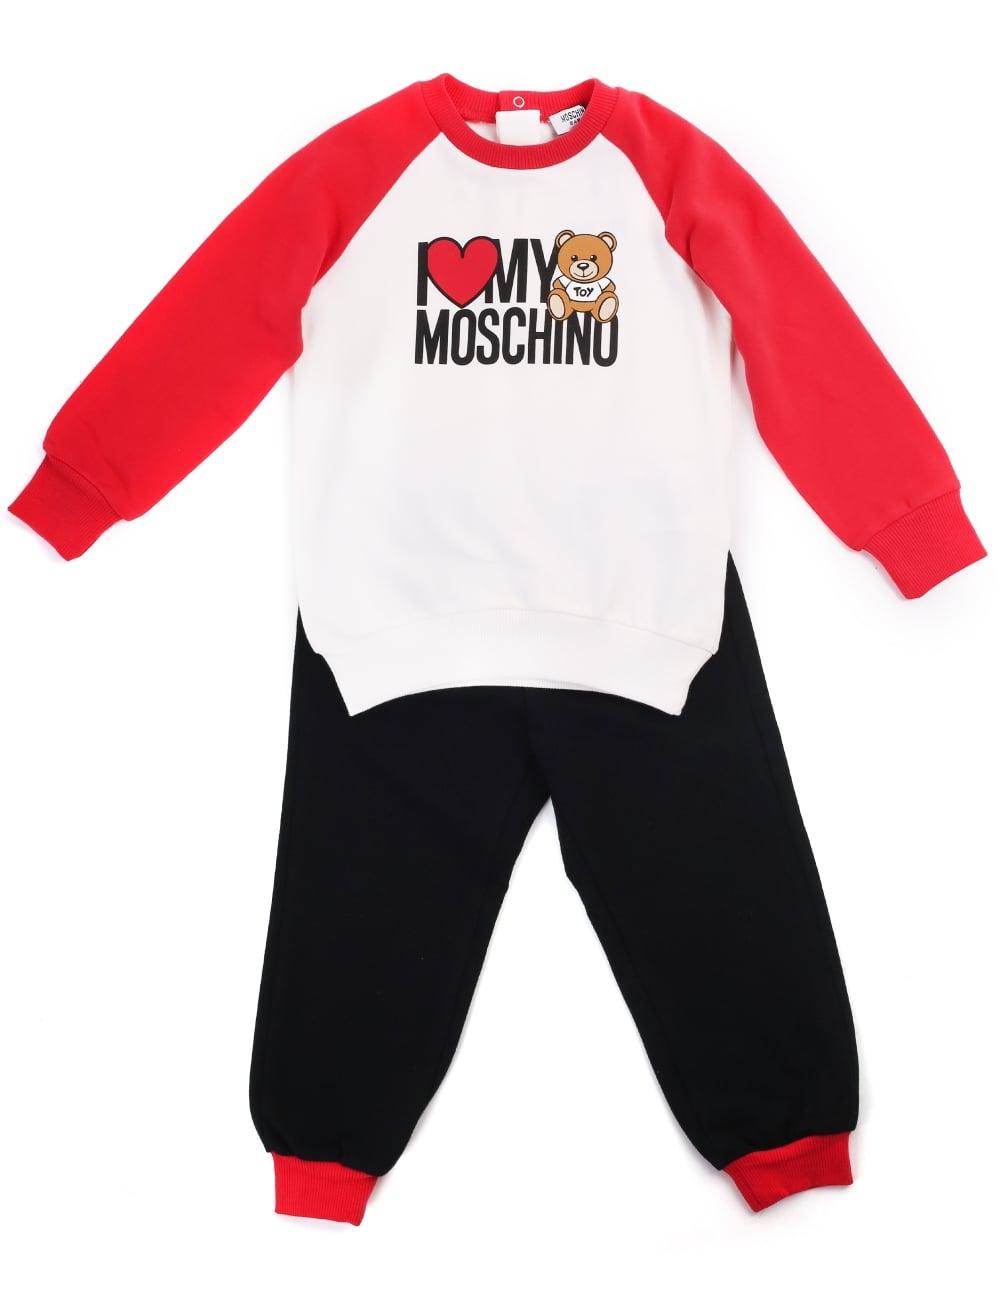 Moschino Boys I Love My Moschino Tracksuit 98da15d99